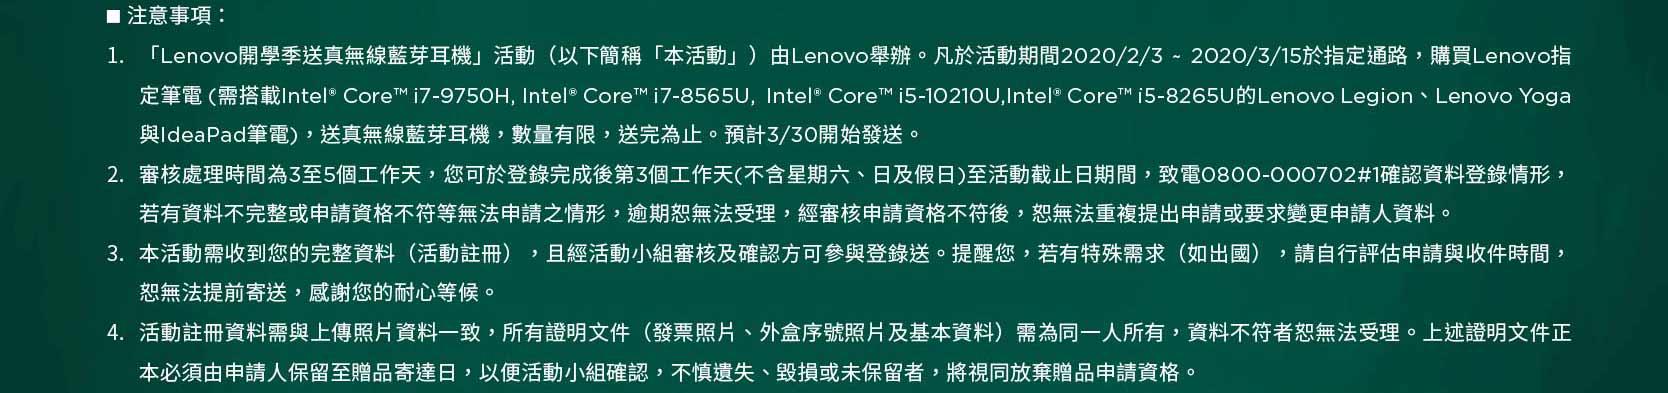 Lenovo 2020 BTS Promotions